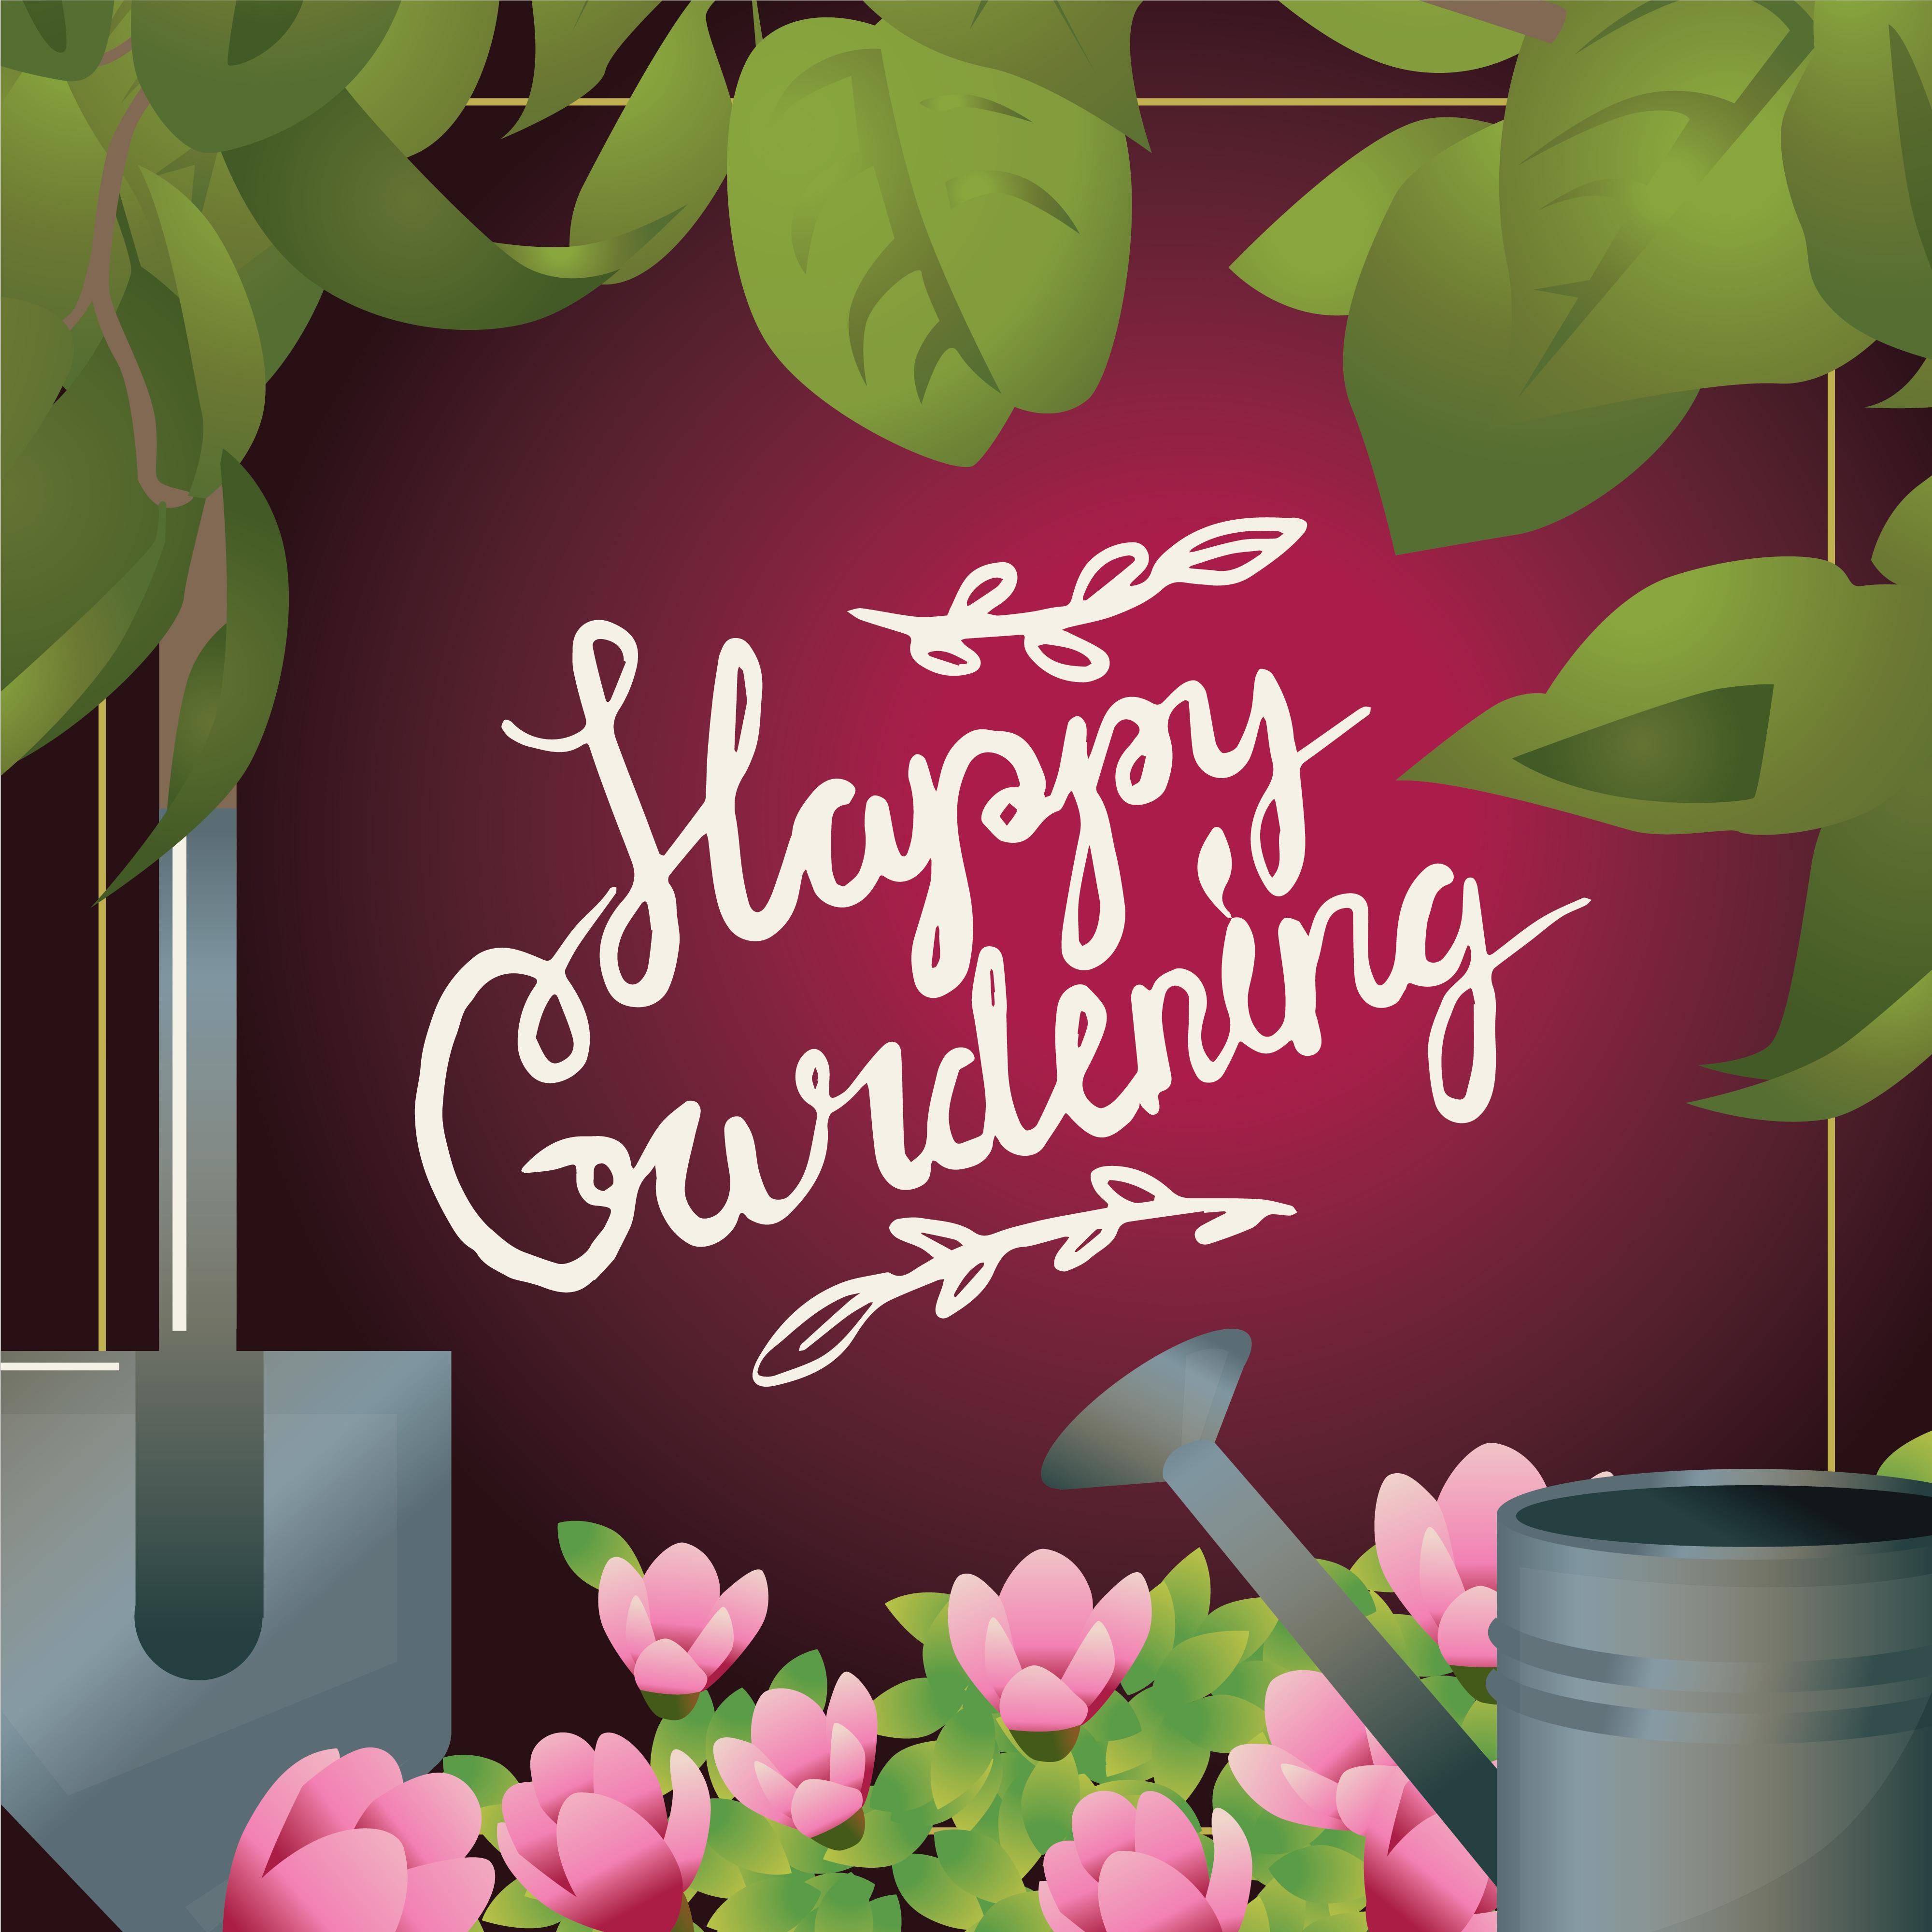 Леттеринг про садоводство